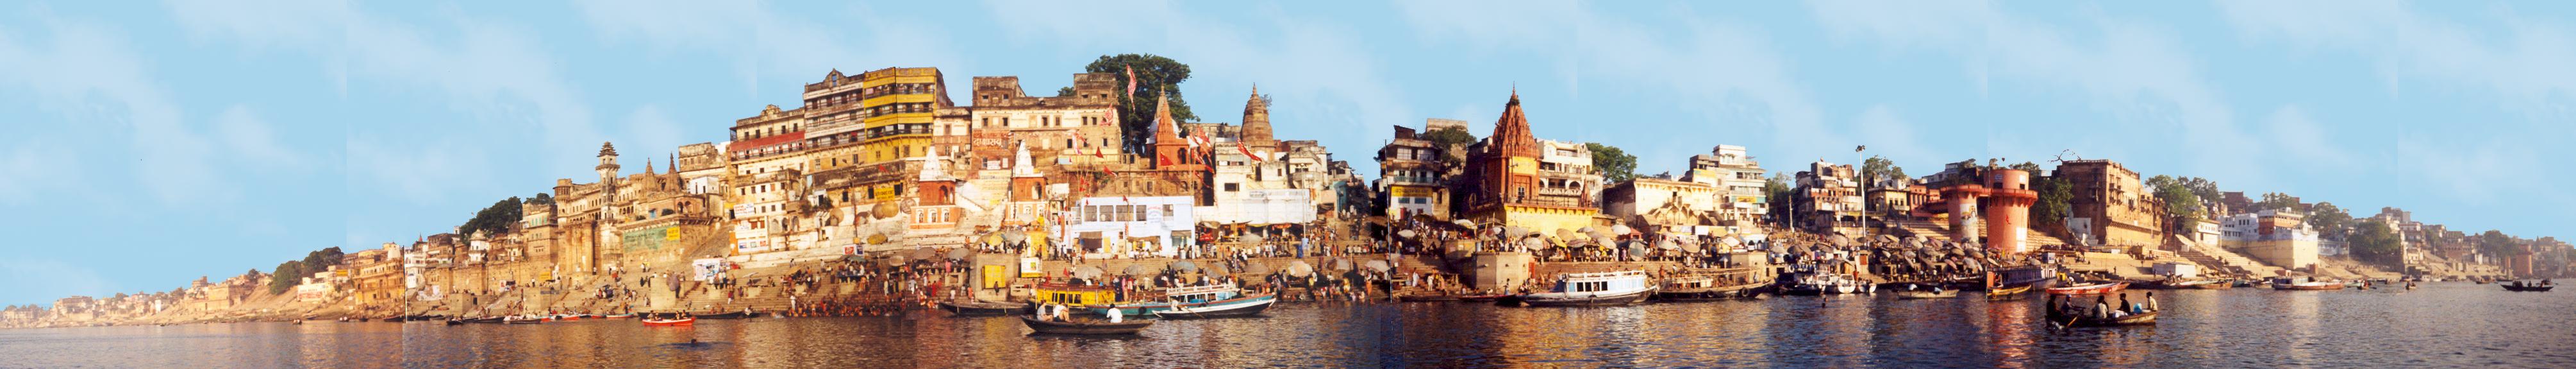 Varanasi_panorama.jpg